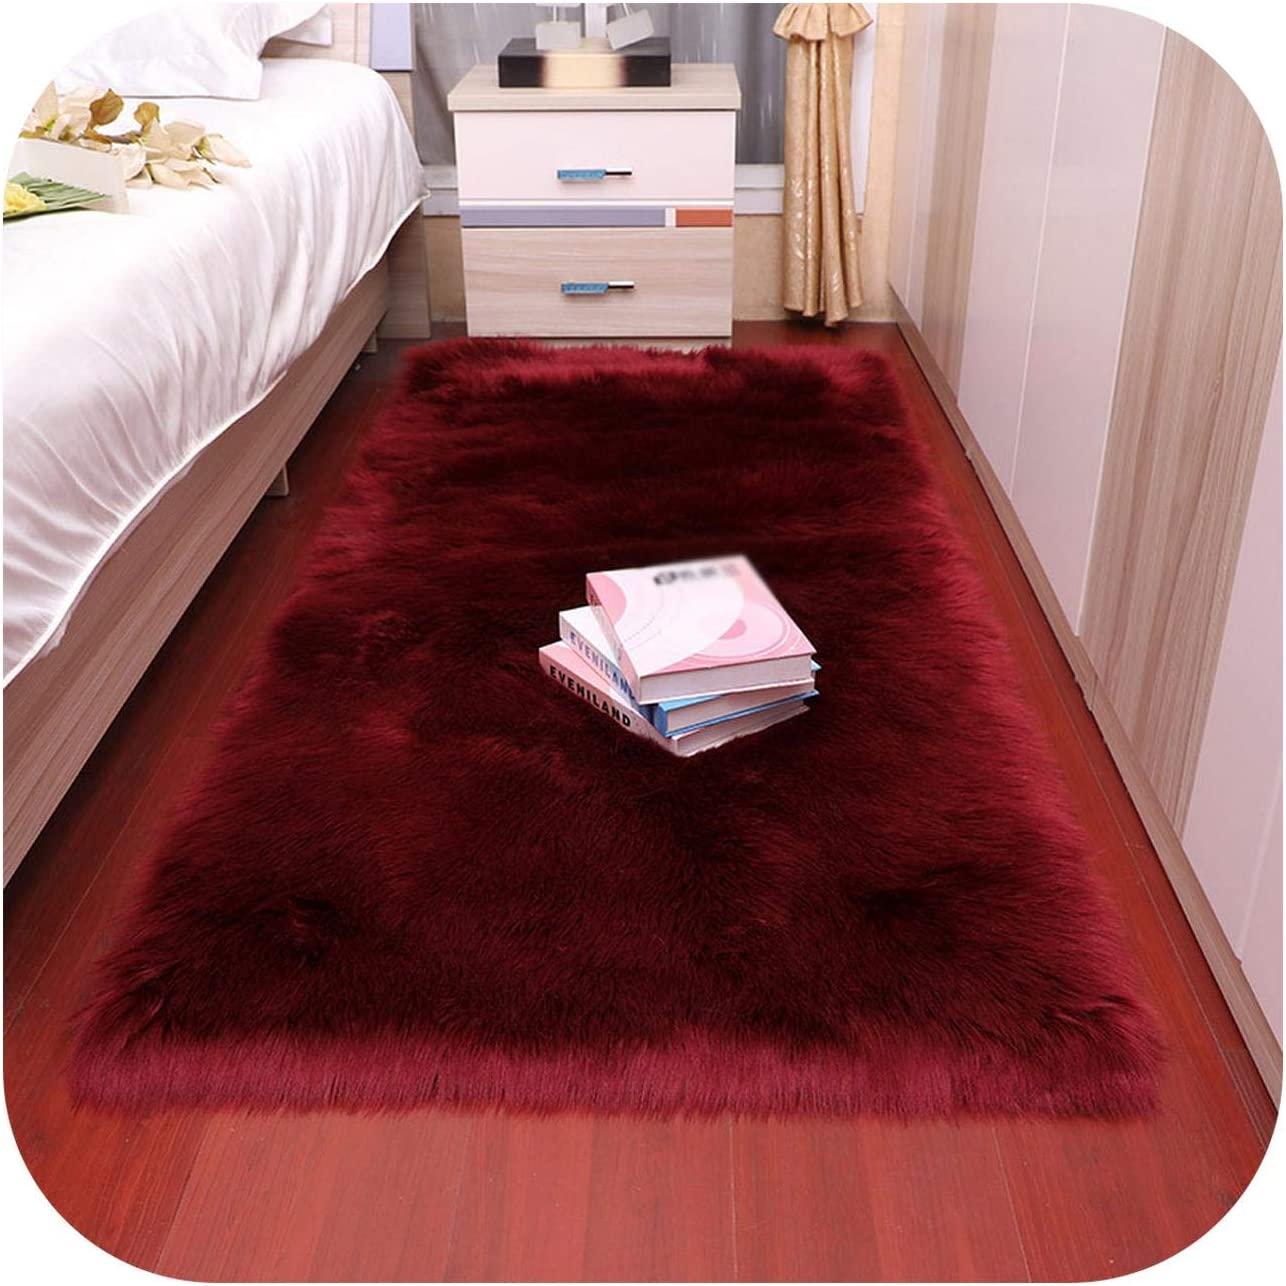 Furry Mats Room, Faux Fur Fluffy Carpet Rug Living Room Floor Area for Bedroom Sheepskin 6cm Pile Home Deco-deep Red-120x180cm